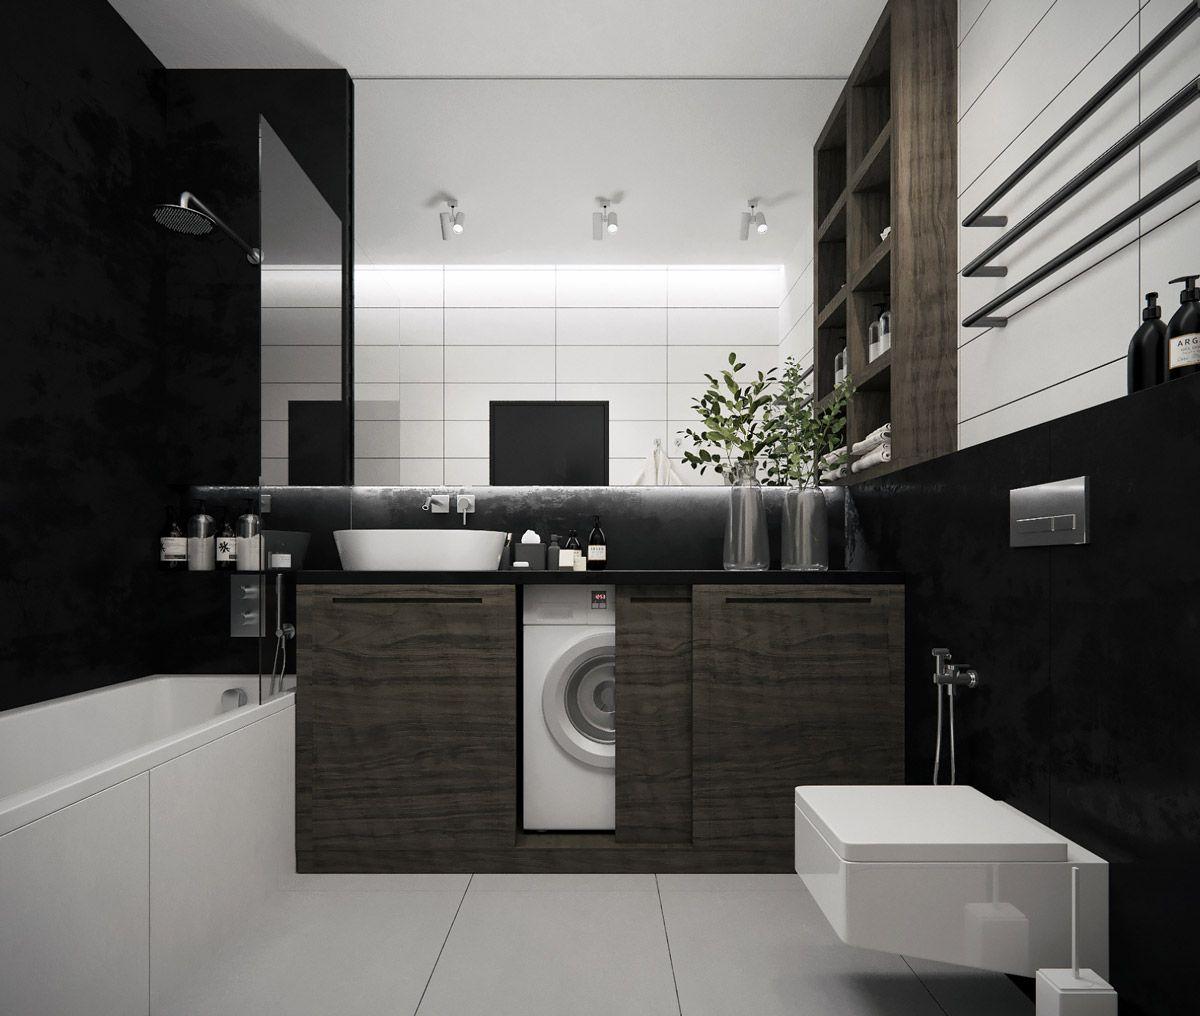 astounding calming modern minimalist bathroom white | 40 Modern Minimalist Style Bathrooms | Ship container ...